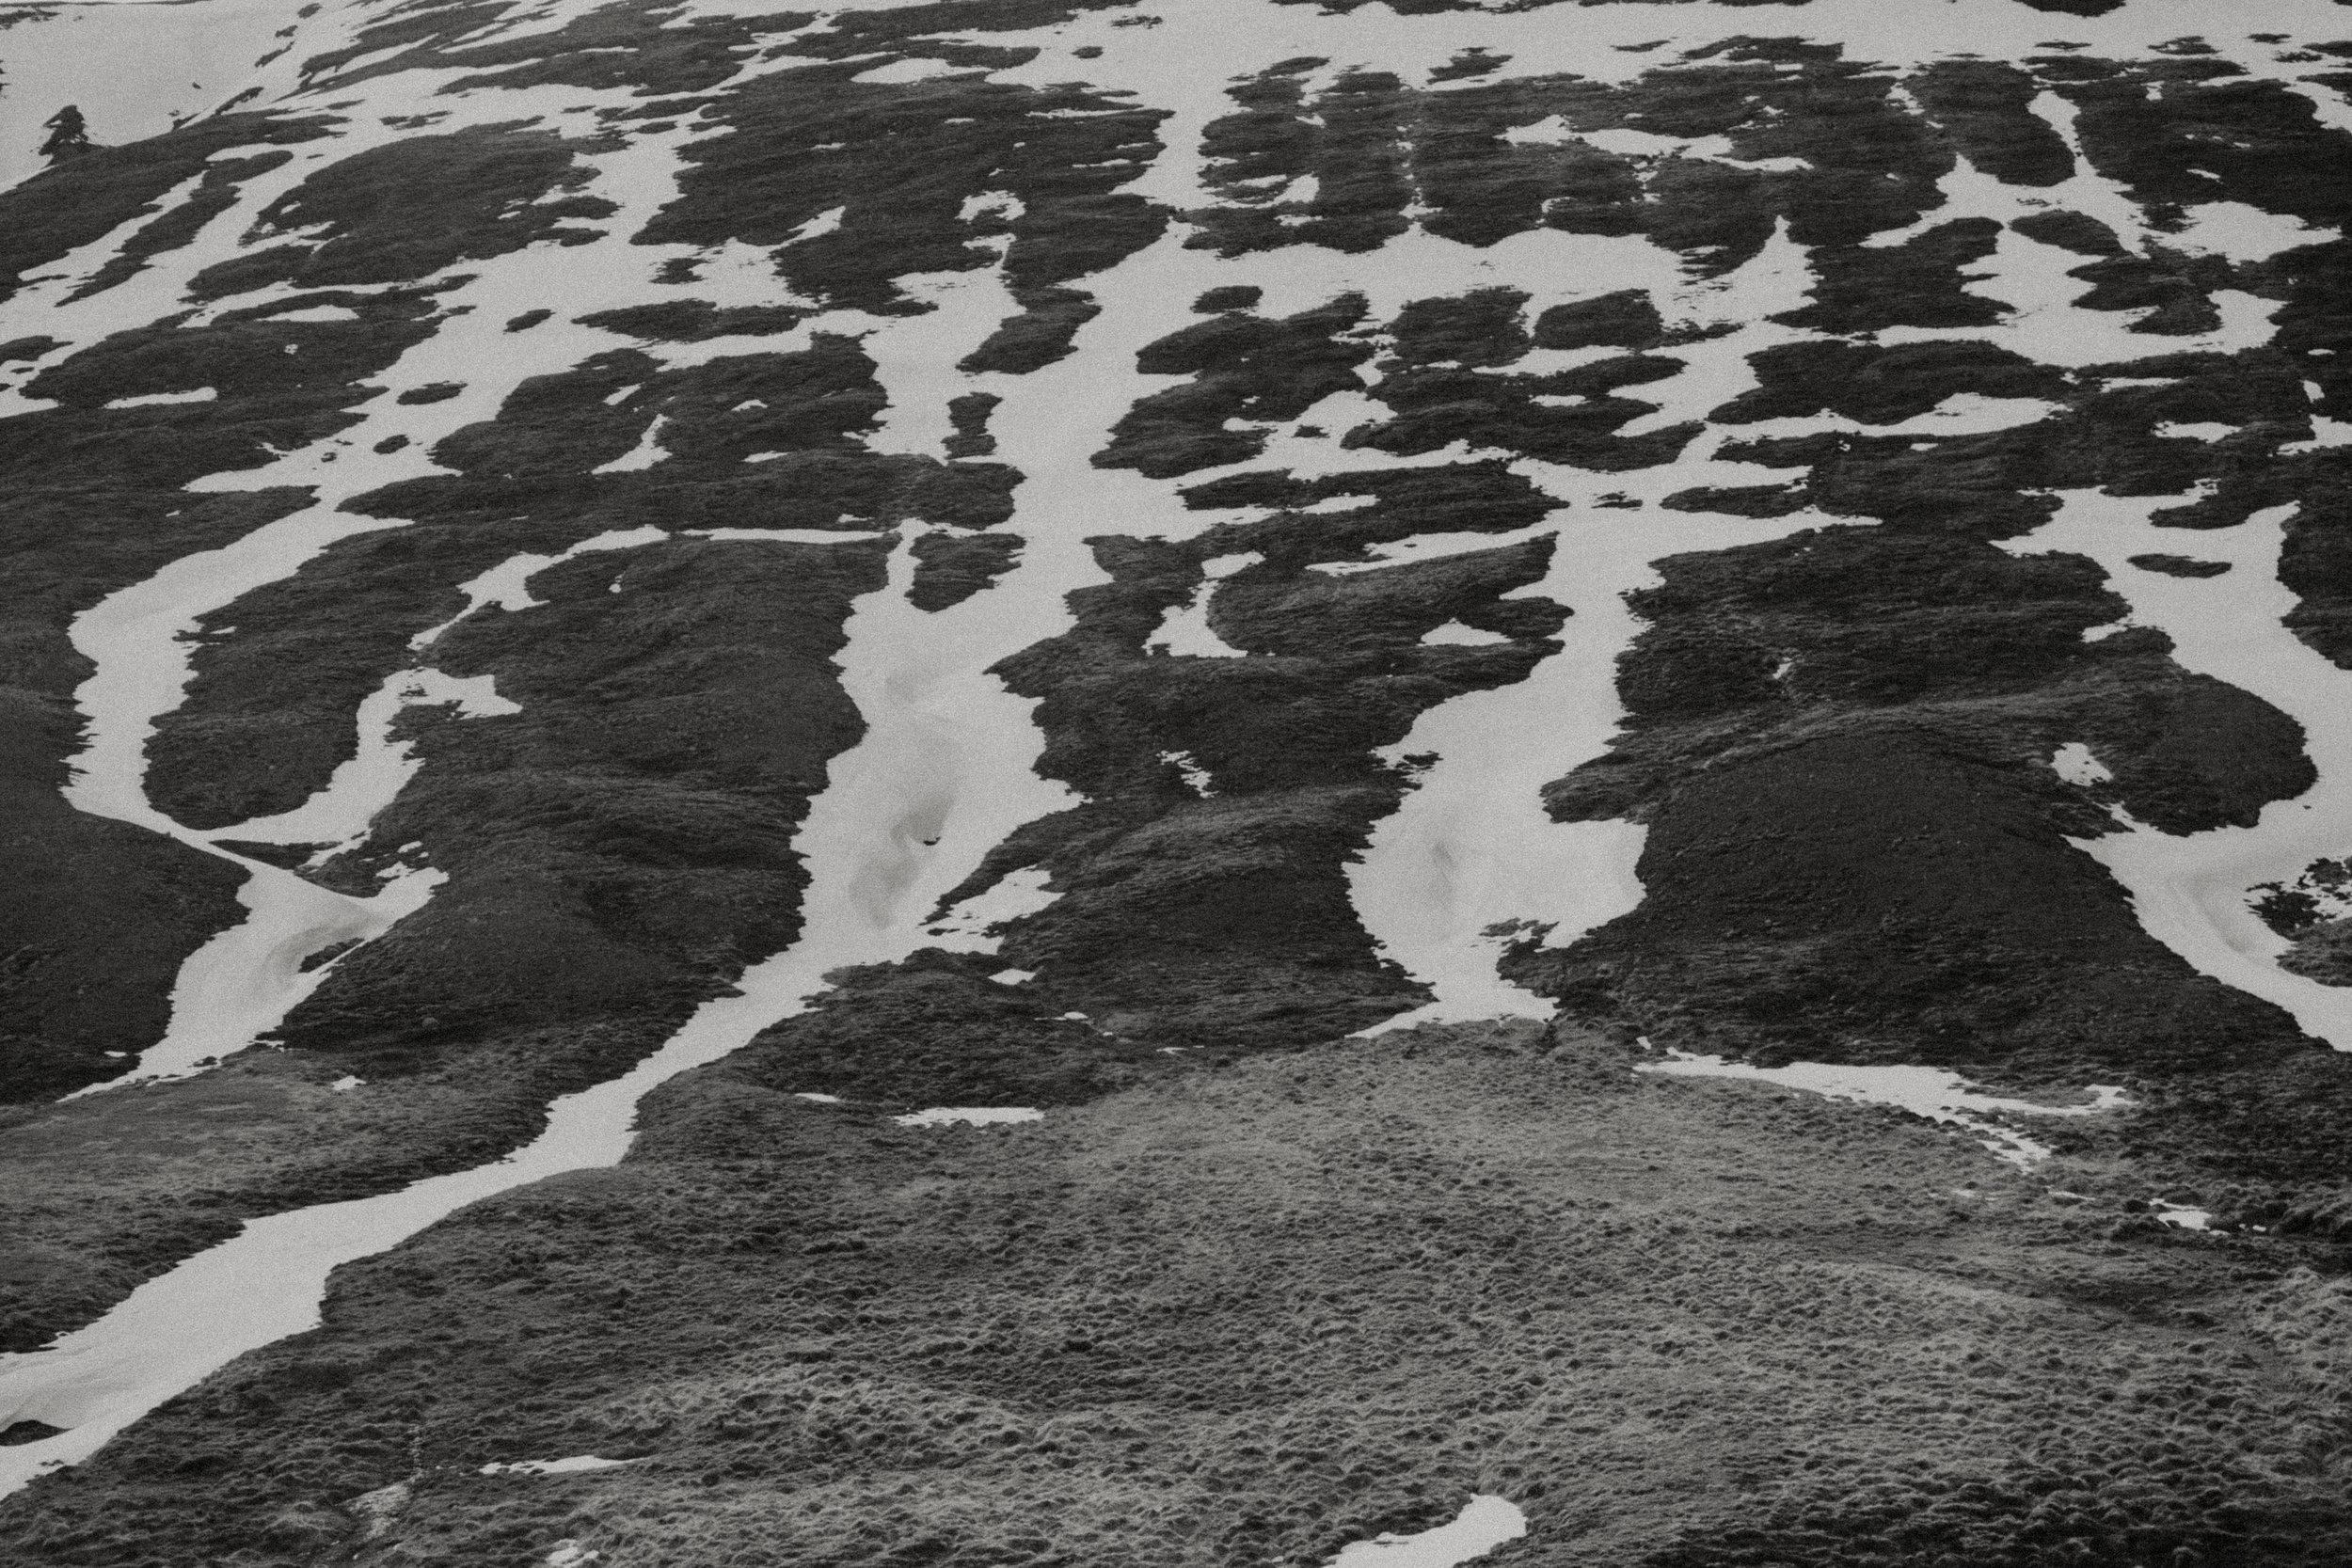 Iceland-honeymoon-4236.jpg